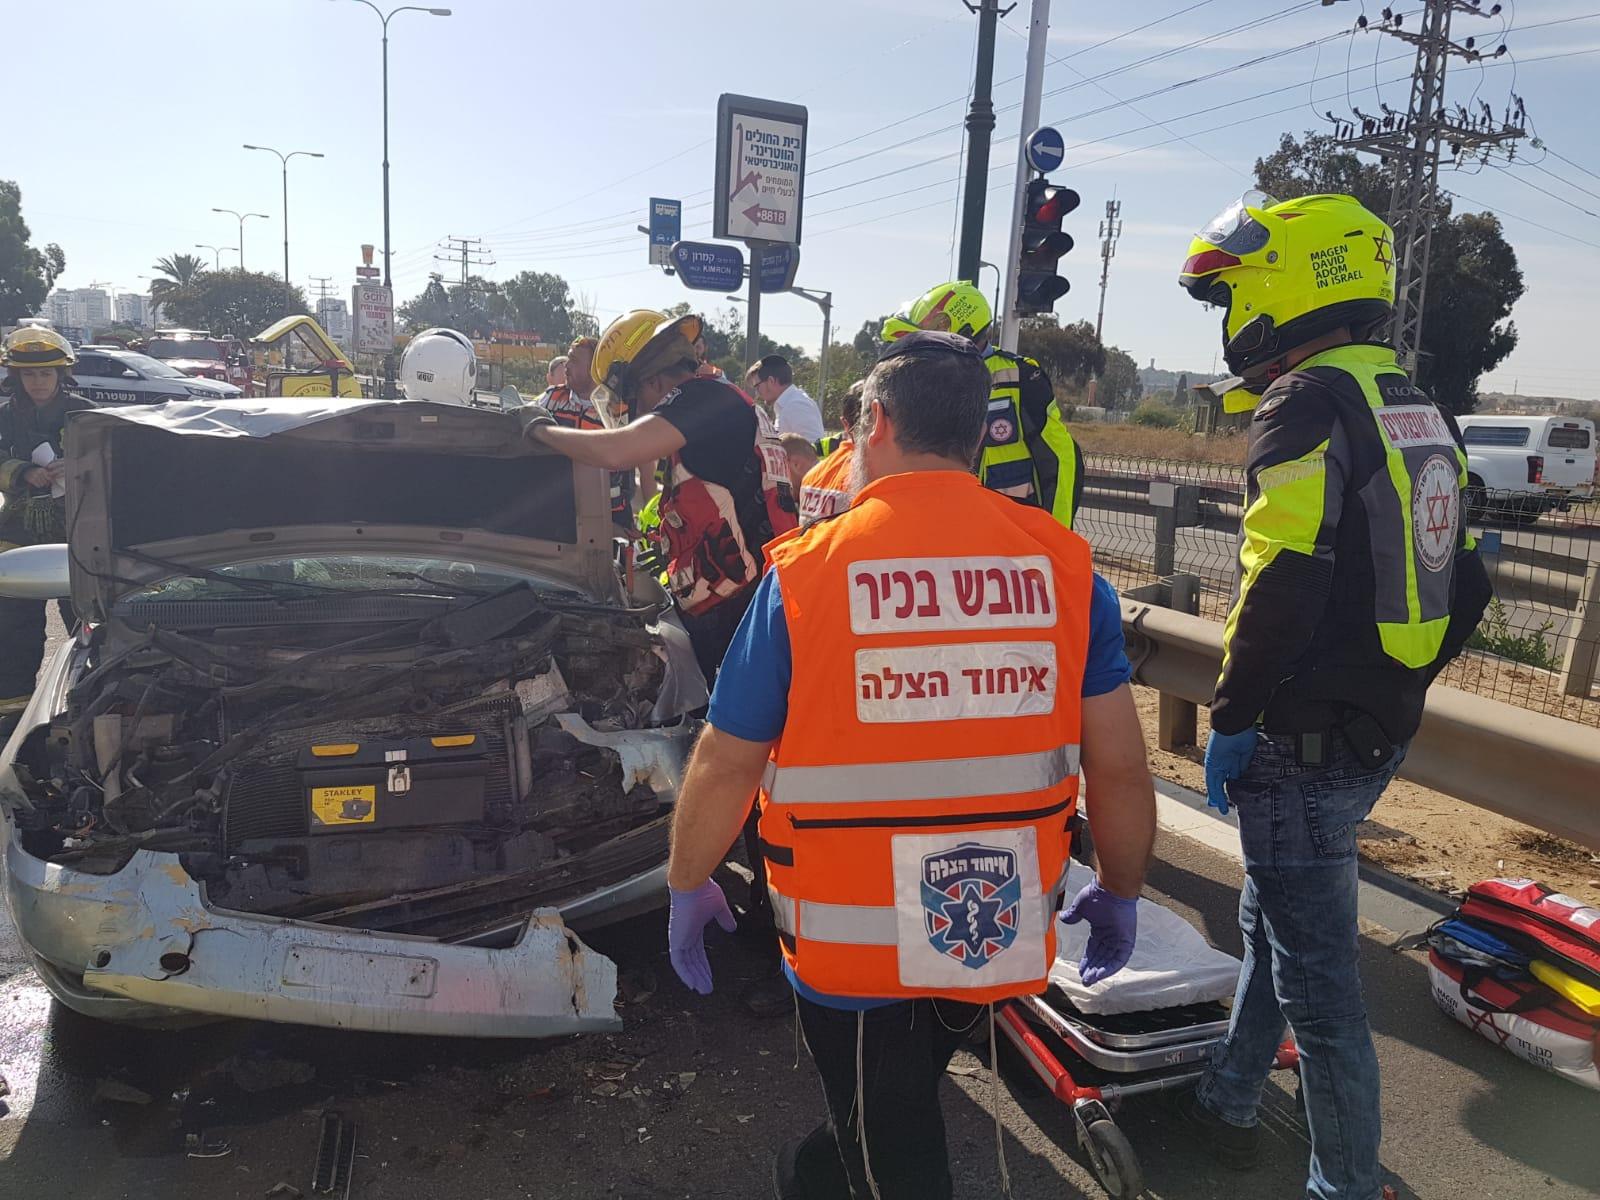 "Photo of תאונה קשה בין שני כלי רכב בדרך המכבים בראשל""צ. פצועה אנוש בזירה חולצה על ידי עוברי אורח"